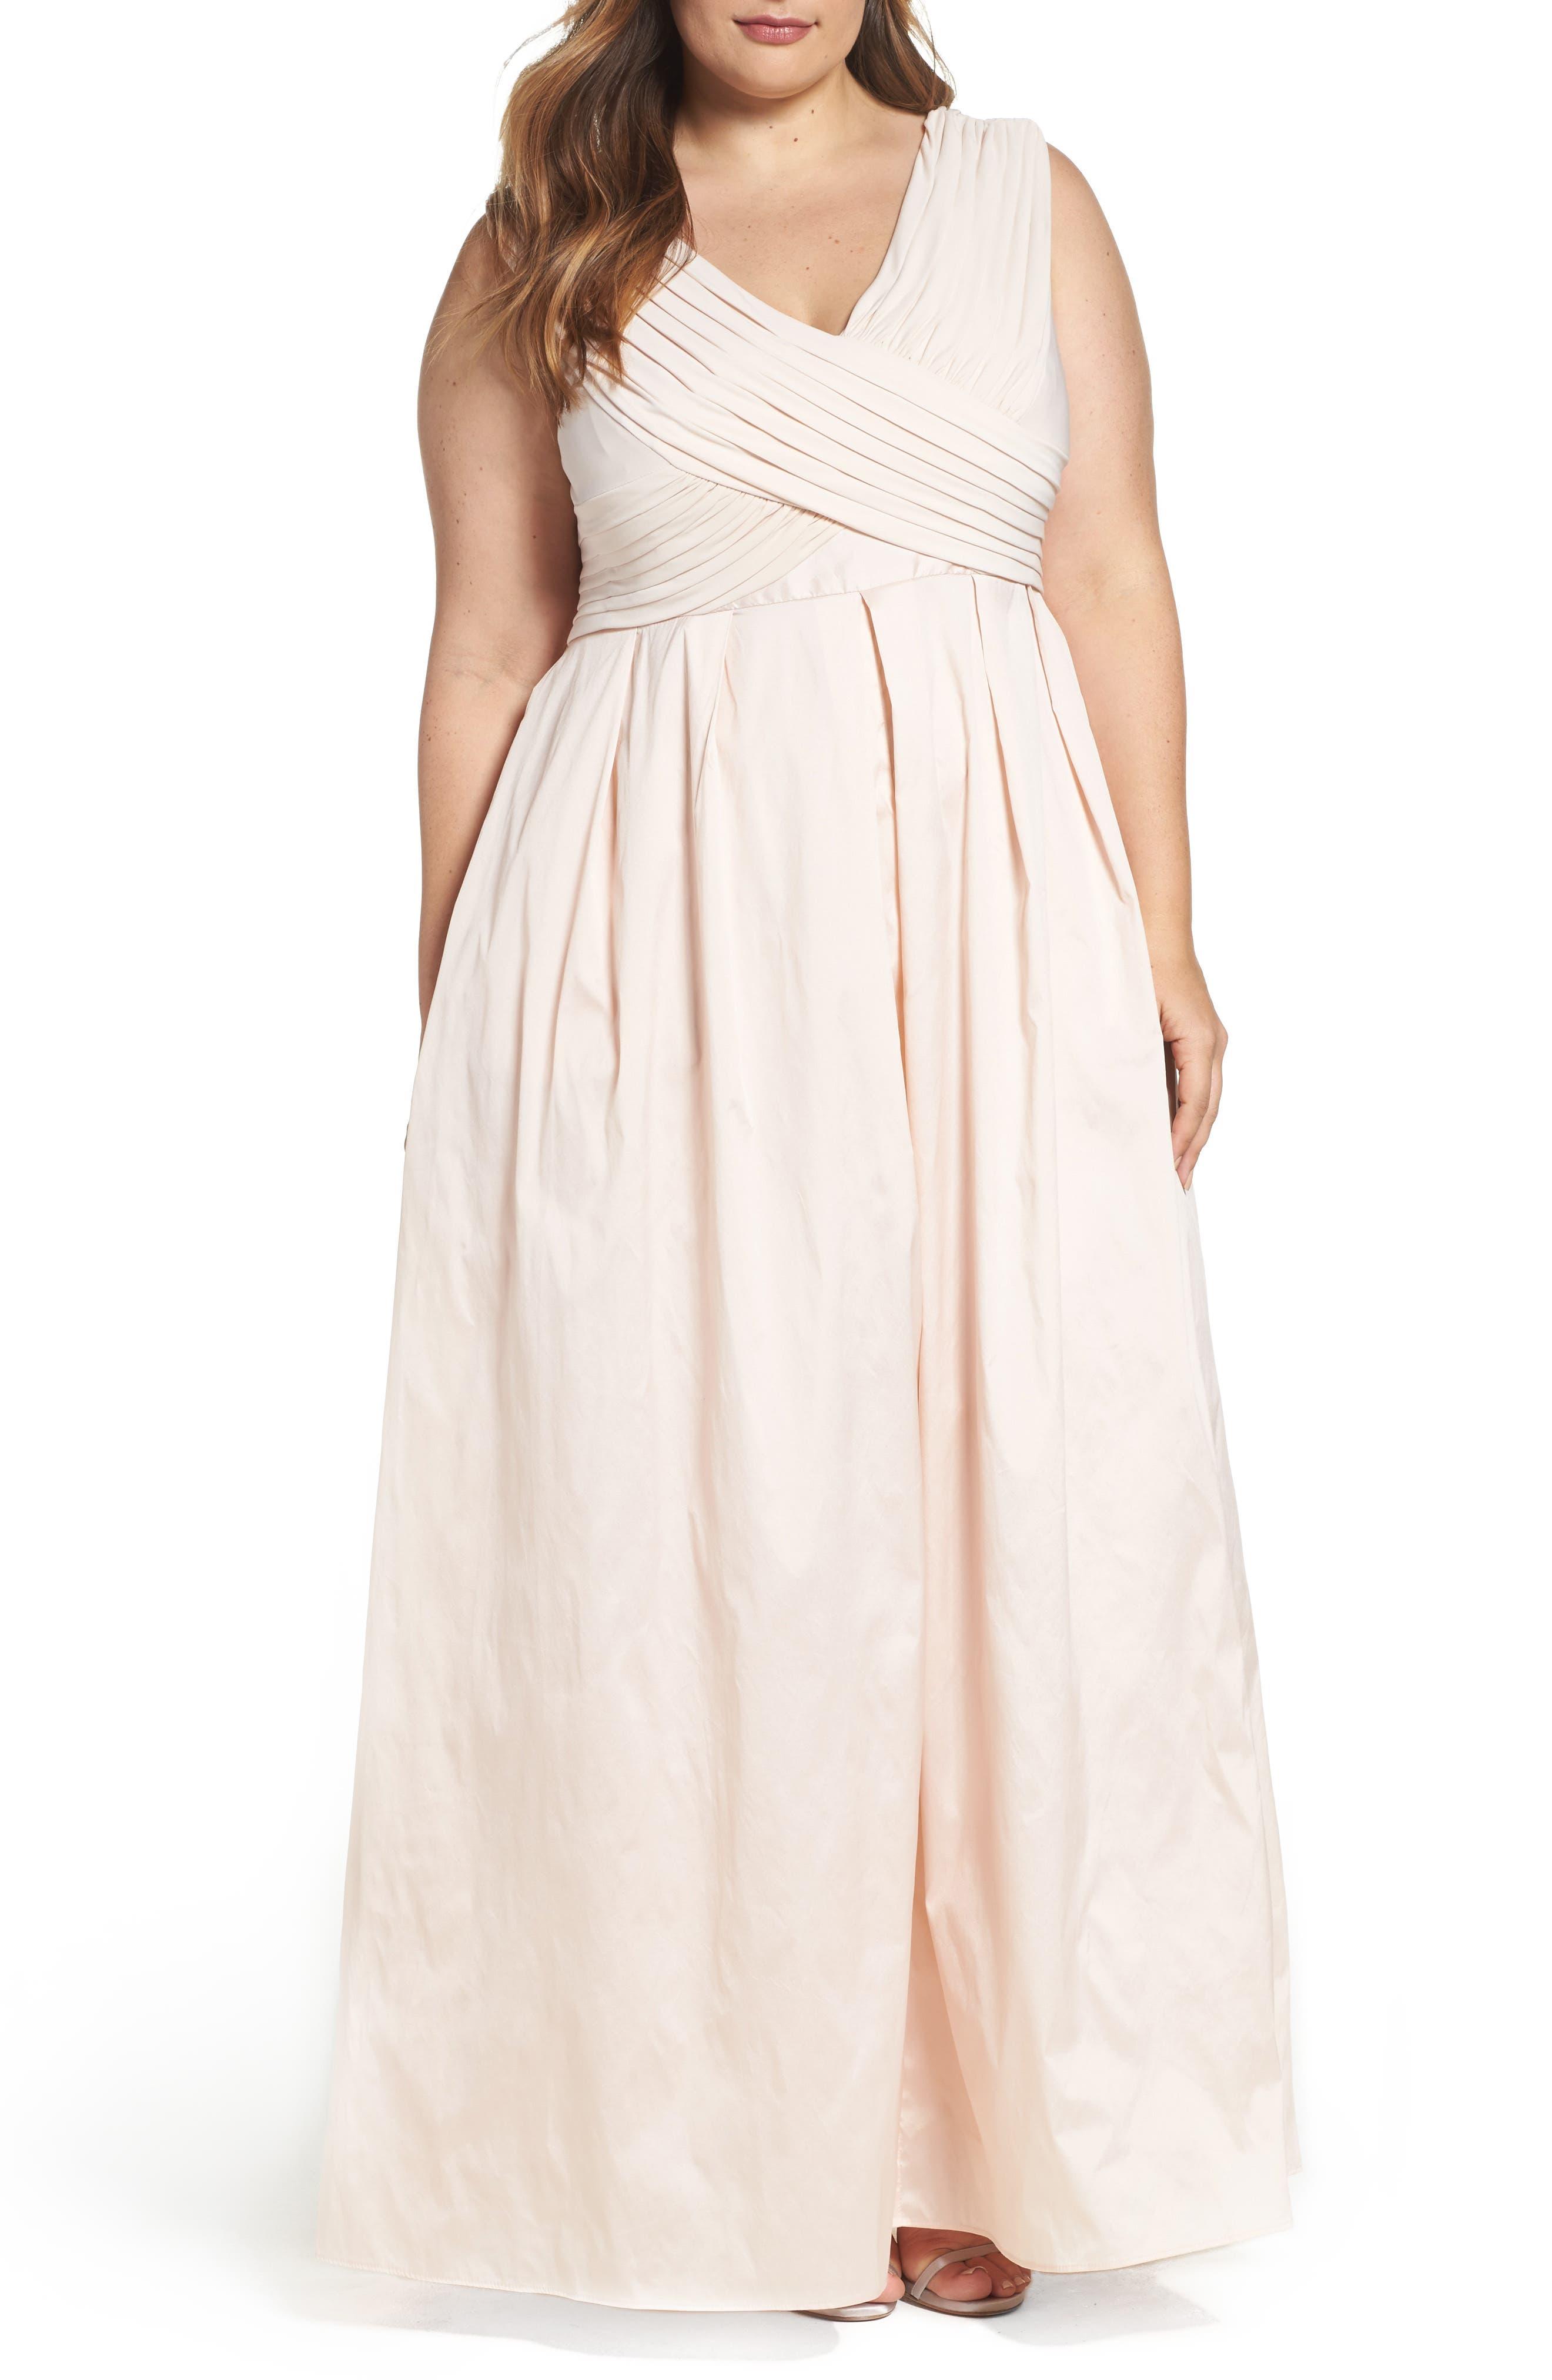 Adrianna Papell Taffeta Gown (Plus Size)